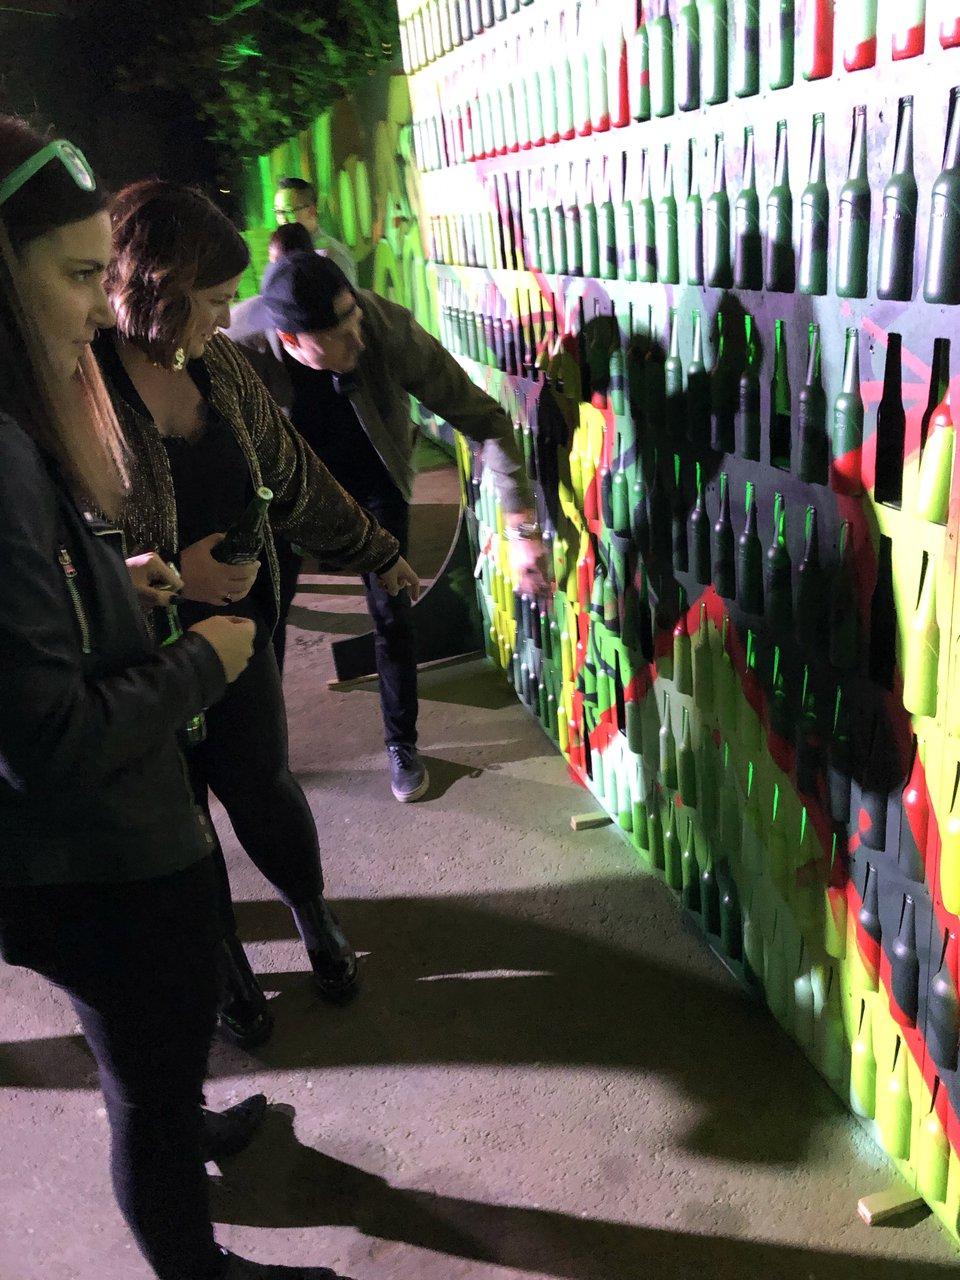 THE PARTY, by Heineken photo 1556490647584_IMG_0017.jpg